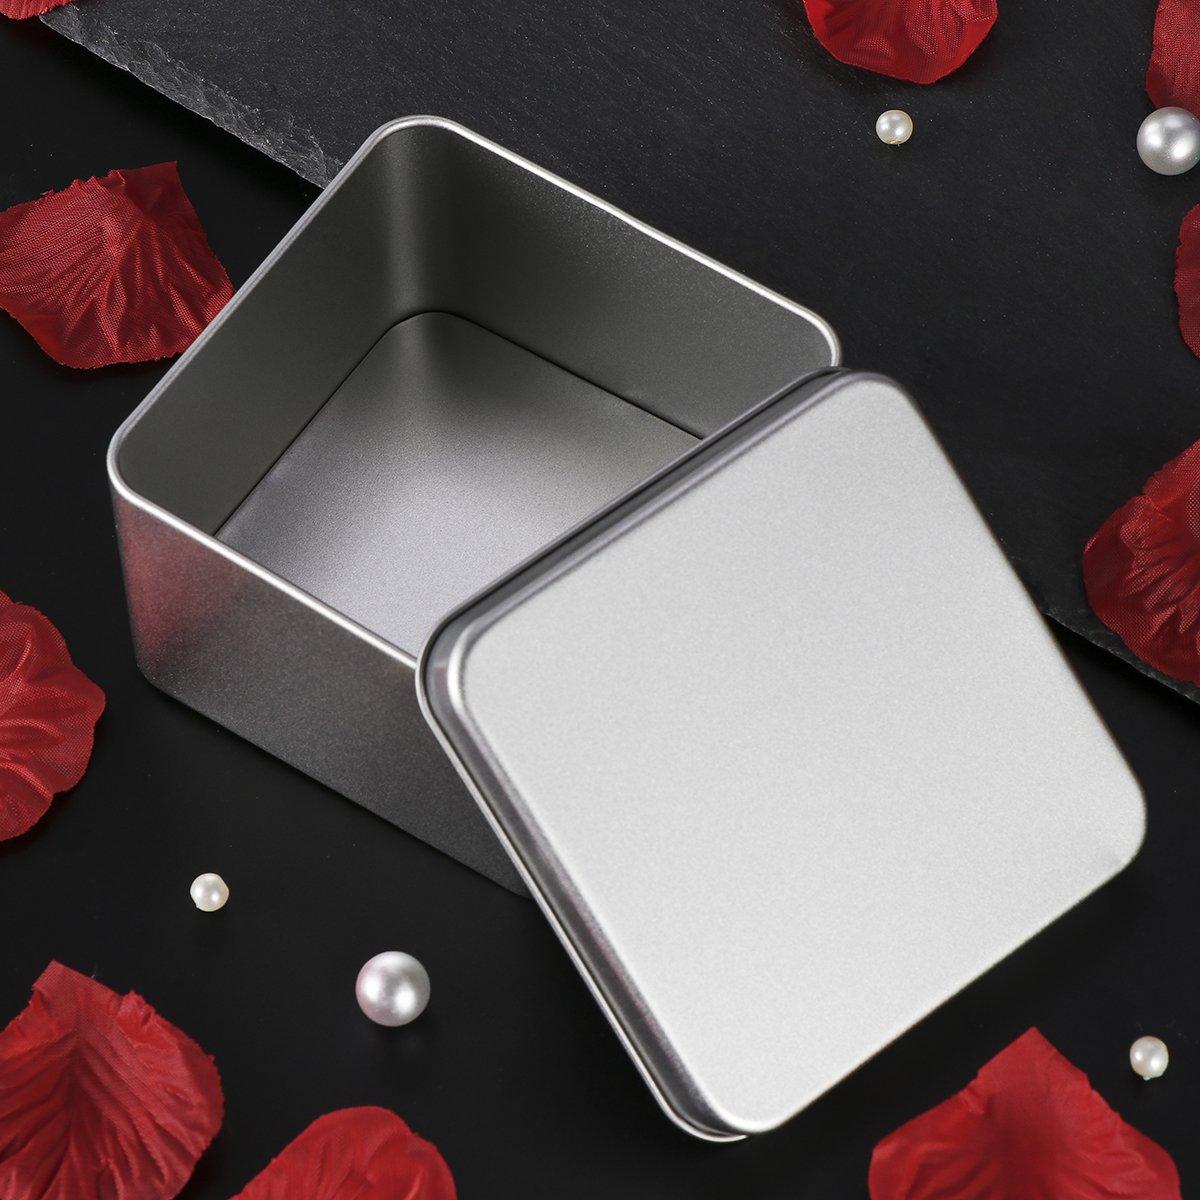 manualidades comida BESTONZON Cajas met/álicas cuadradas de metal plateado Cajas met/álicas transparentes para velas almacenamiento M/ás Plata 90 x 90 x 55 mm